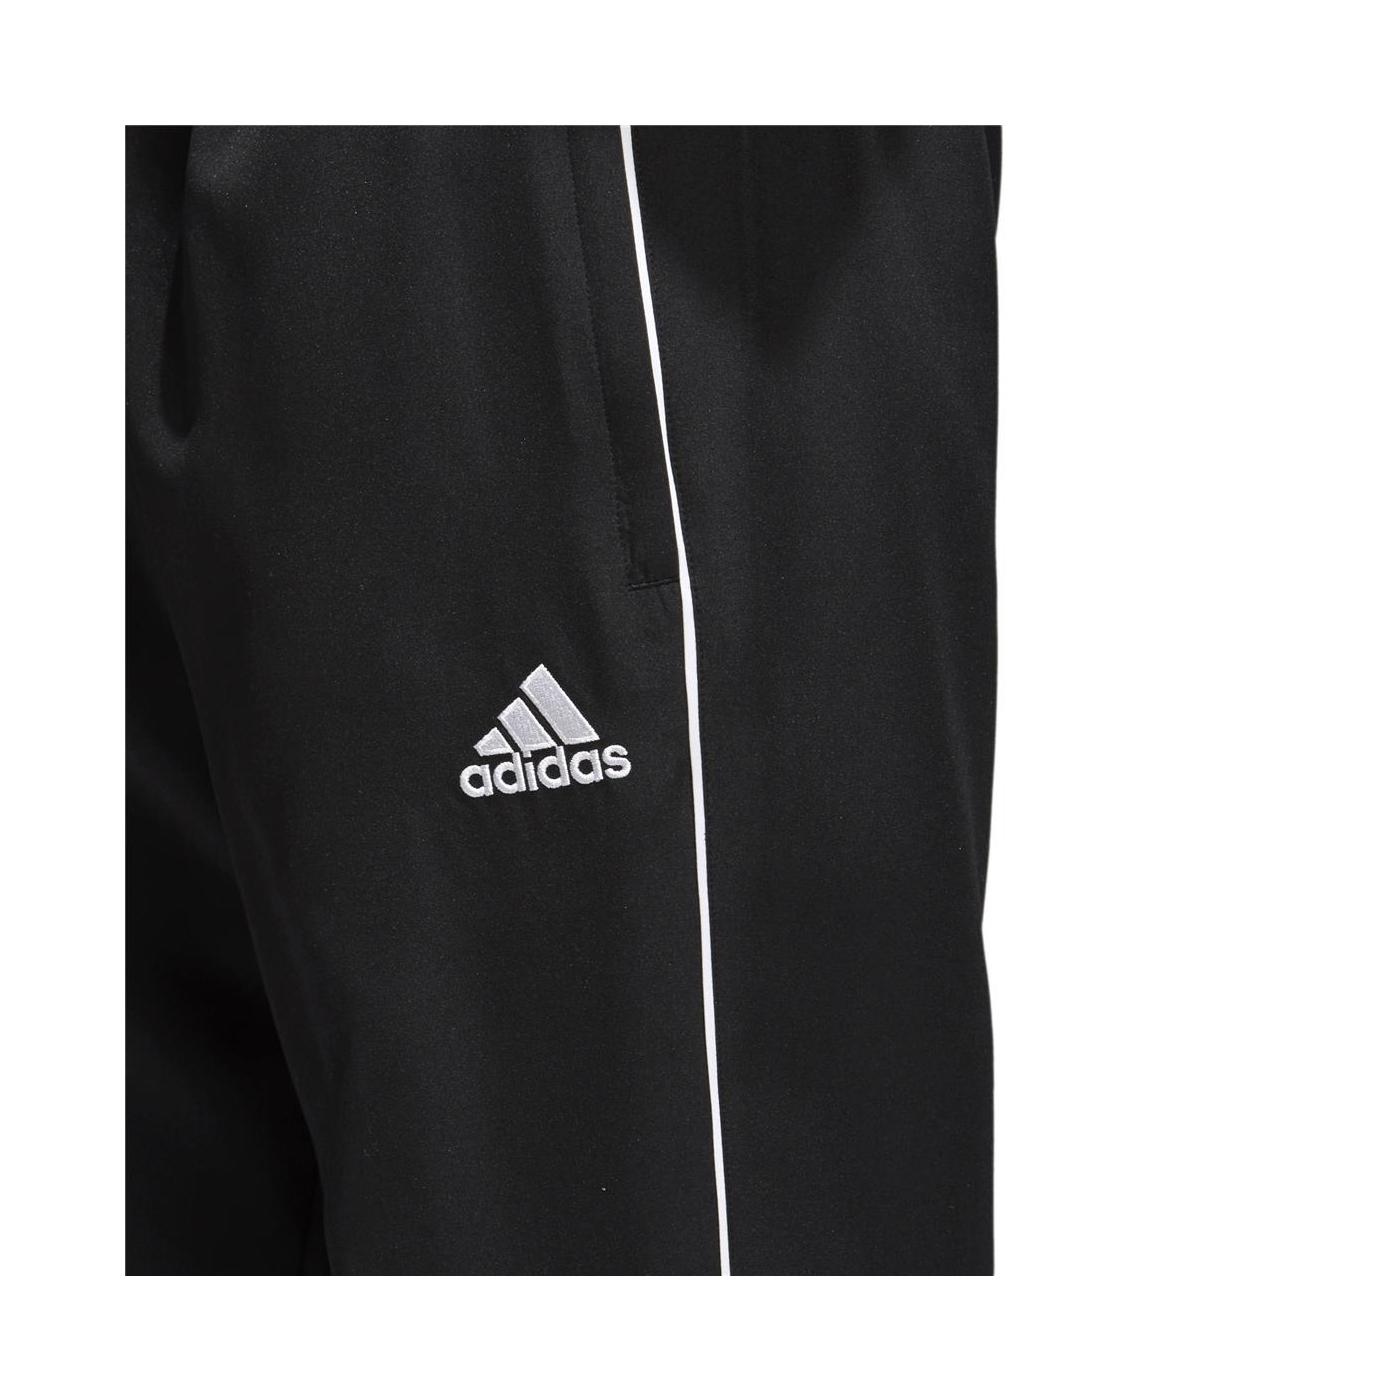 adidas Herren Core 18 ce9045 Präsentationshose: